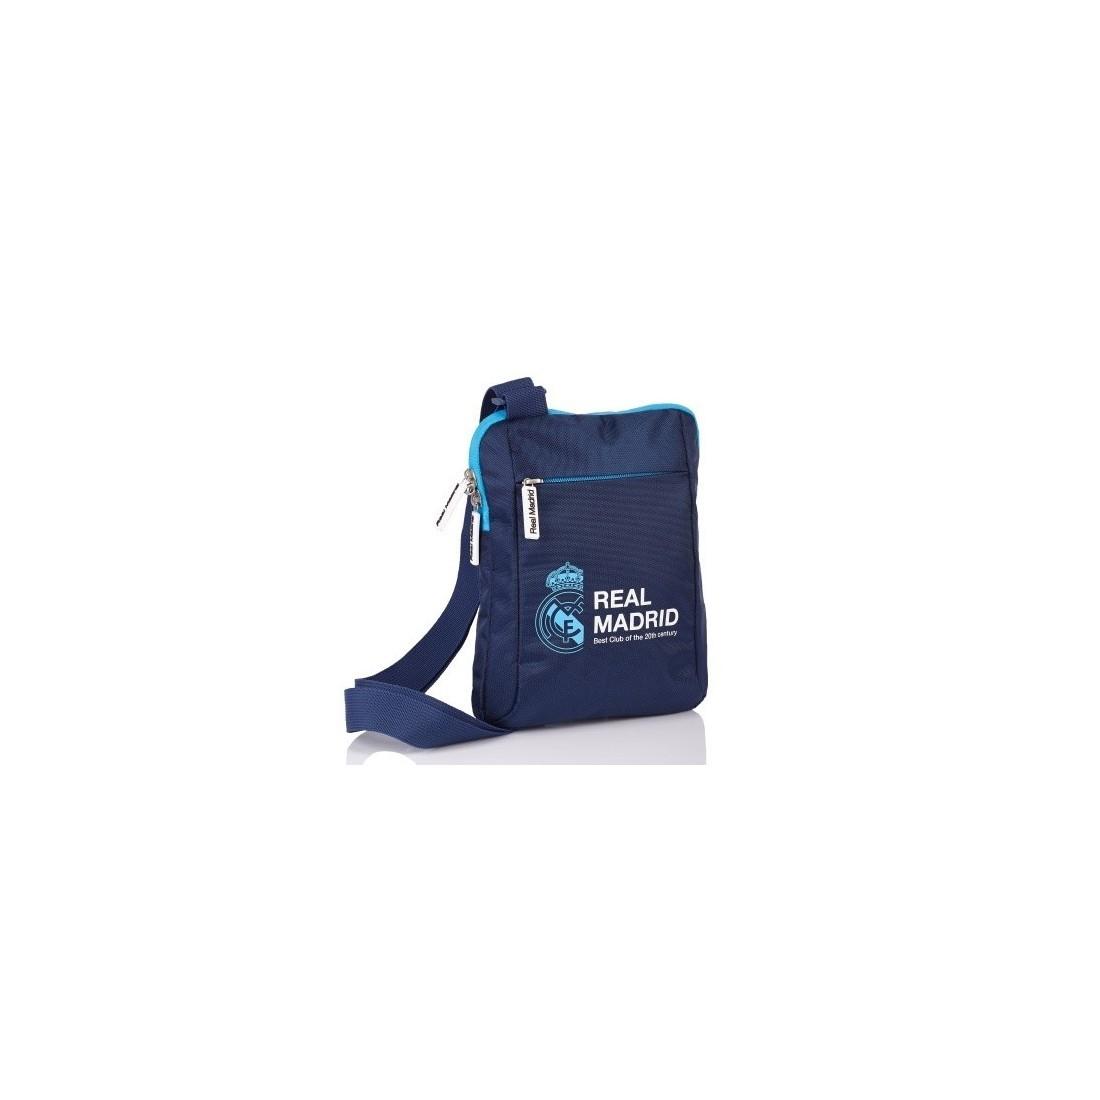 5312162b8efa5 Astra plecaki i akcesoria licencyjne (5) strona 5 - plecak-tornister.pl